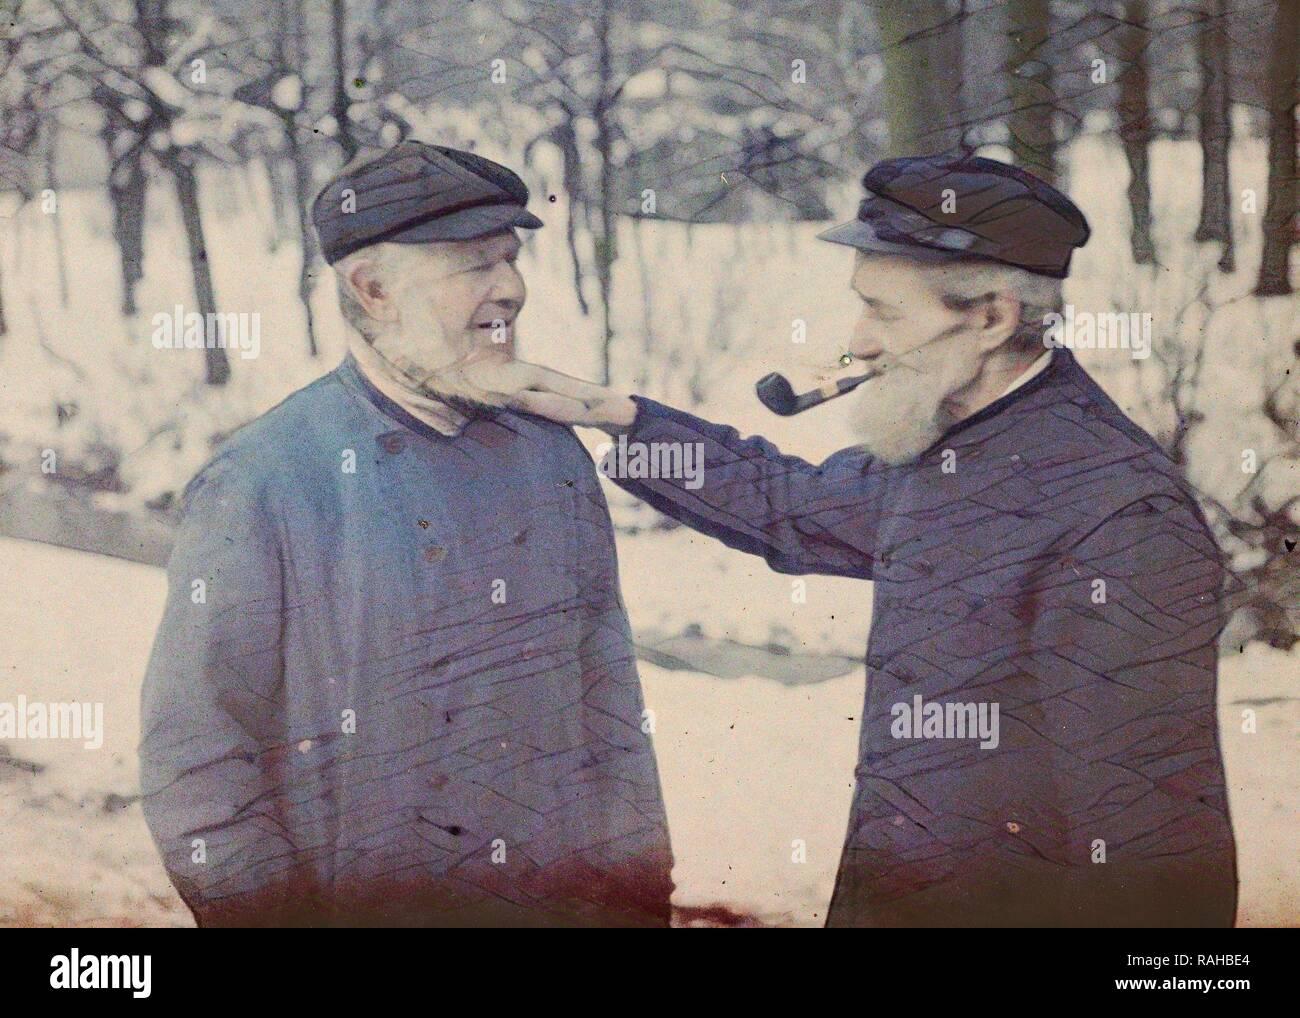 Two farmers, Rotterdam, The Netherlands, Sebastiaan Alphonse Van Besten, c. 1914 - c. 1920. Reimagined - Stock Image